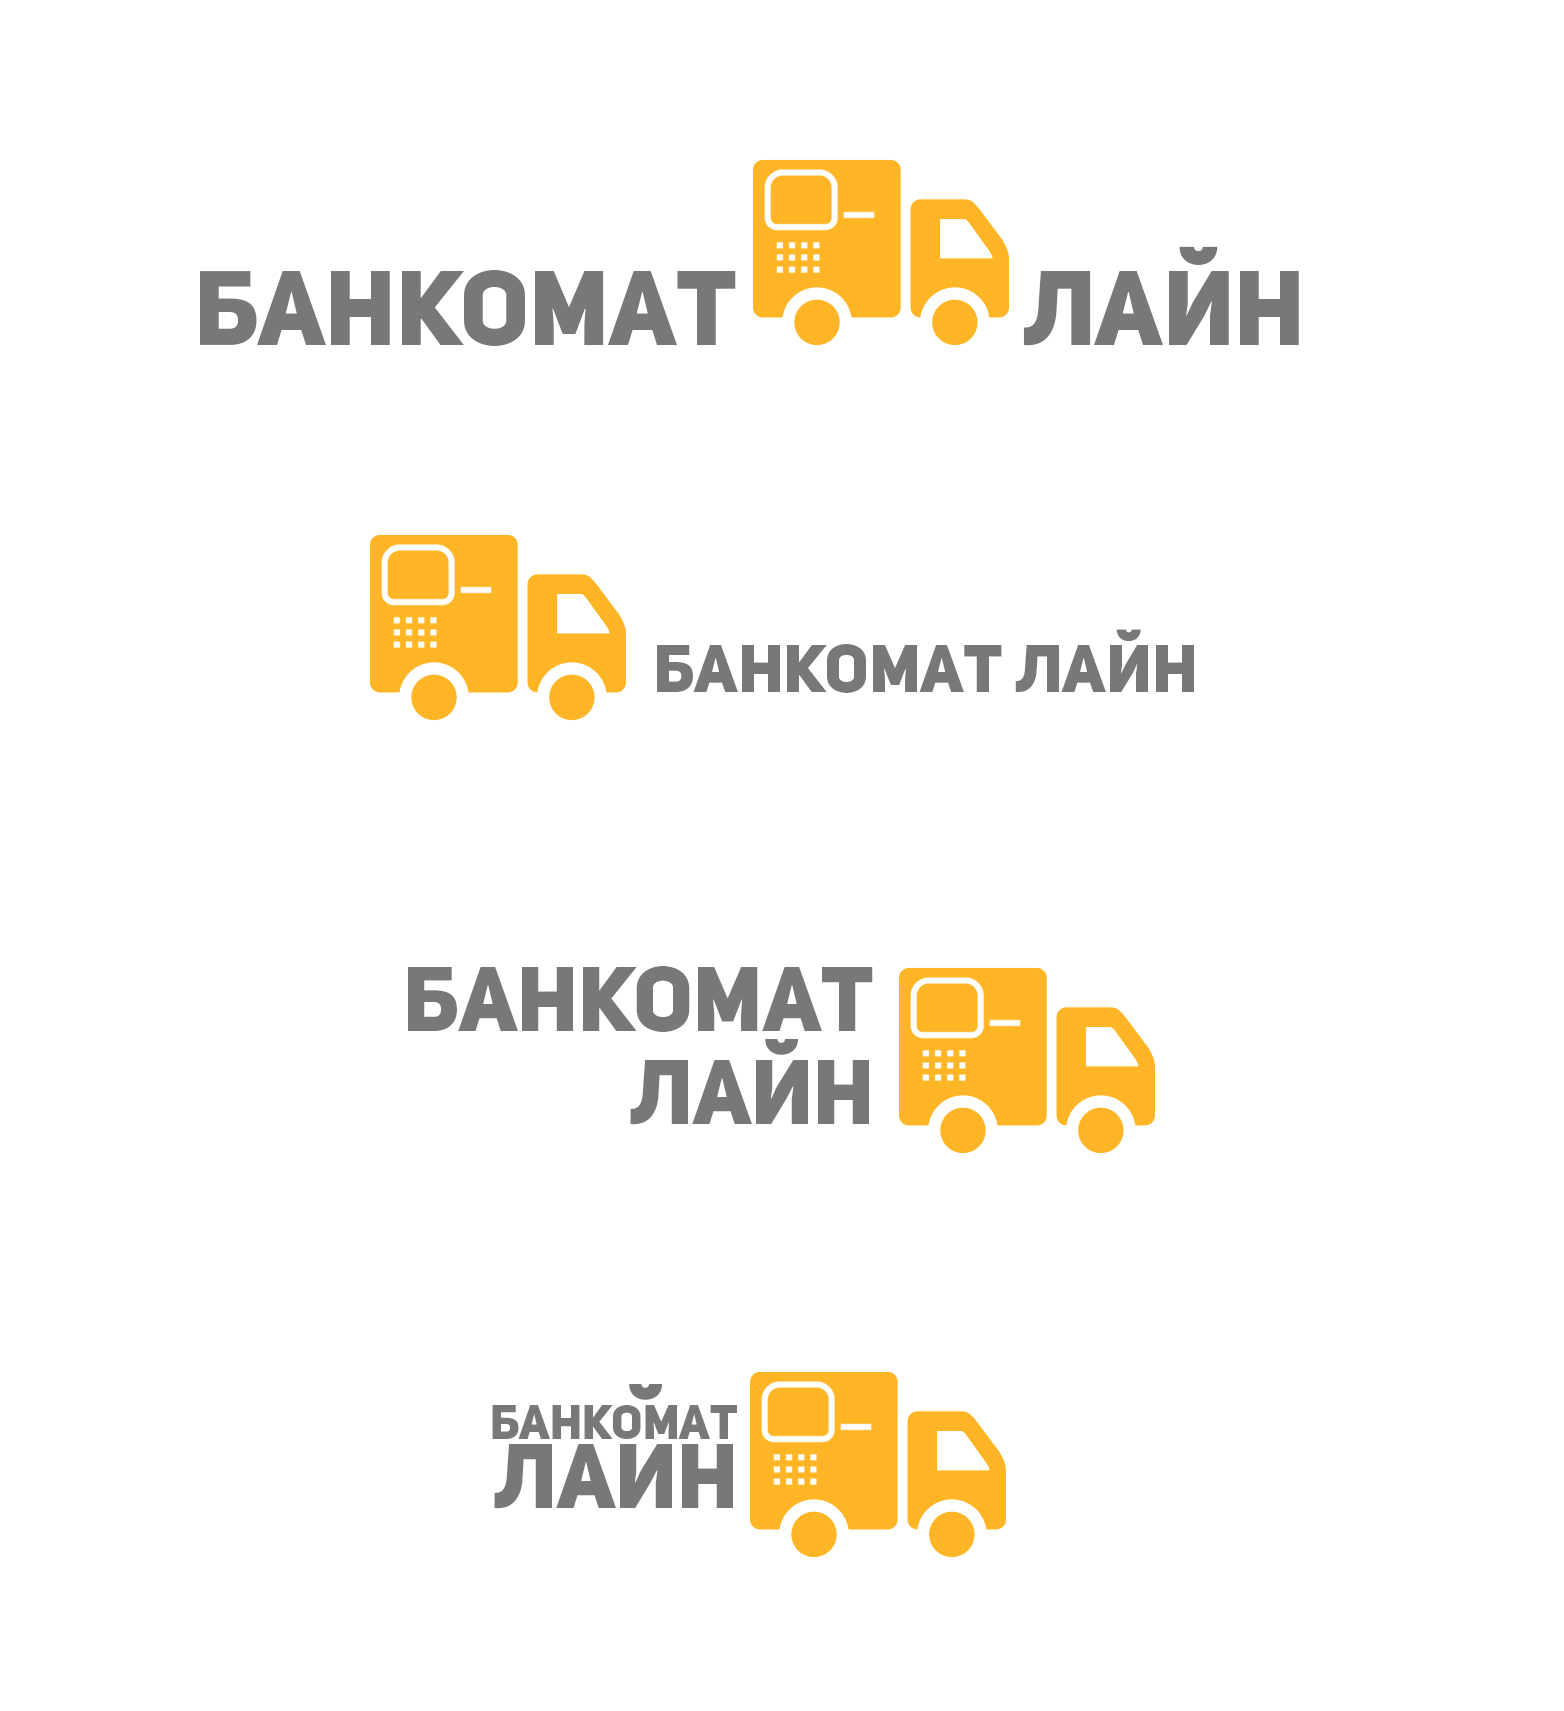 Разработка логотипа и слогана для транспортной компании фото f_918588f546b7bae9.jpg